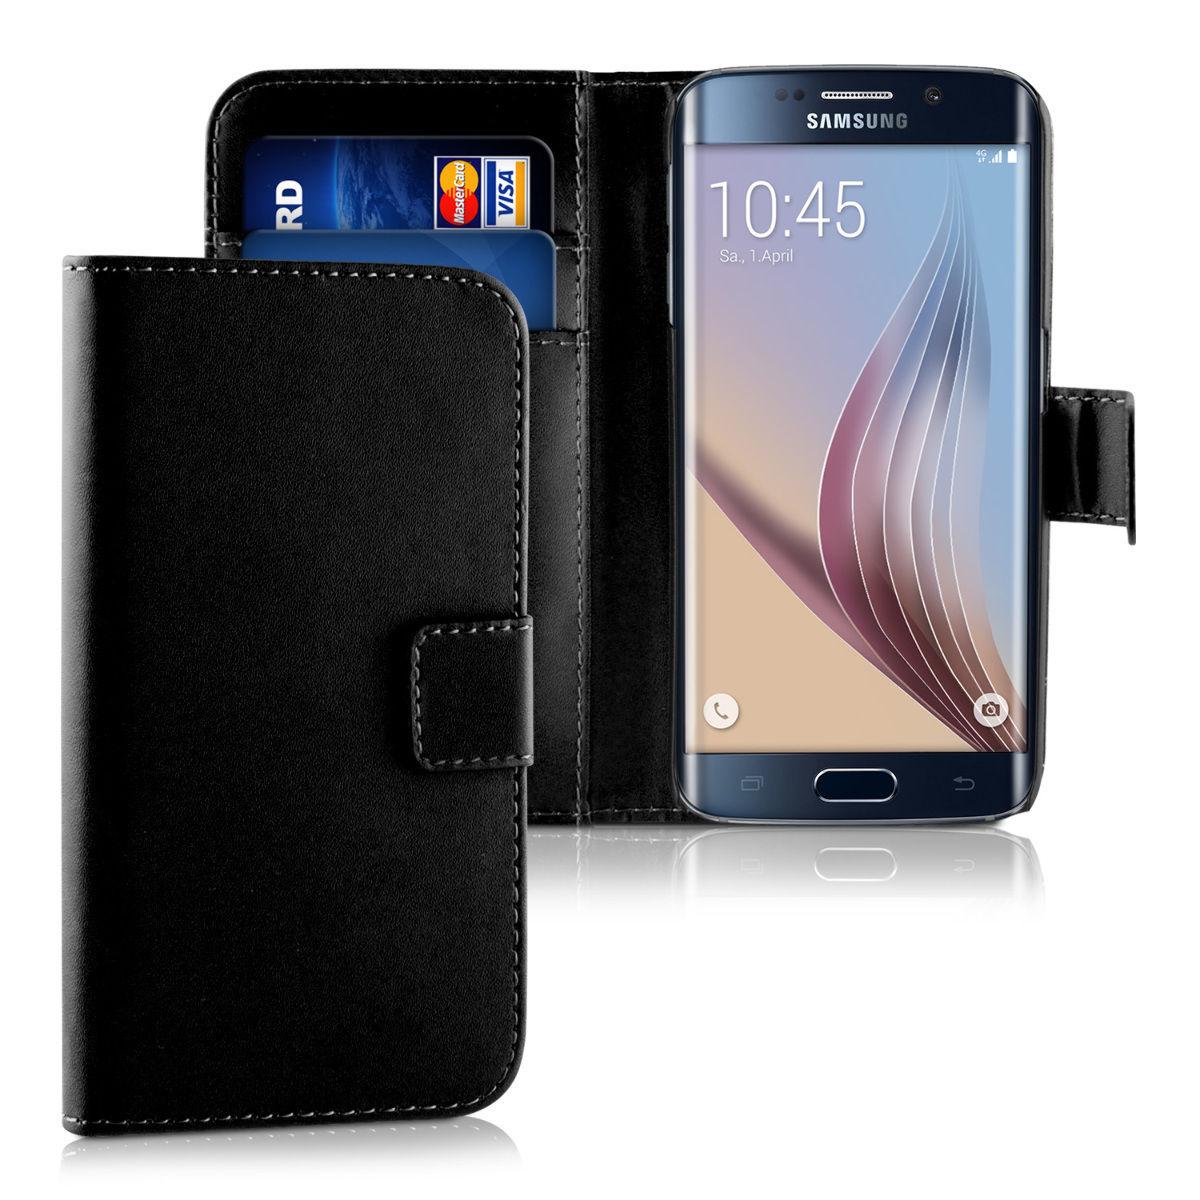 Pouzdro FLIP pro Samsung Galaxy S6 Edge černé